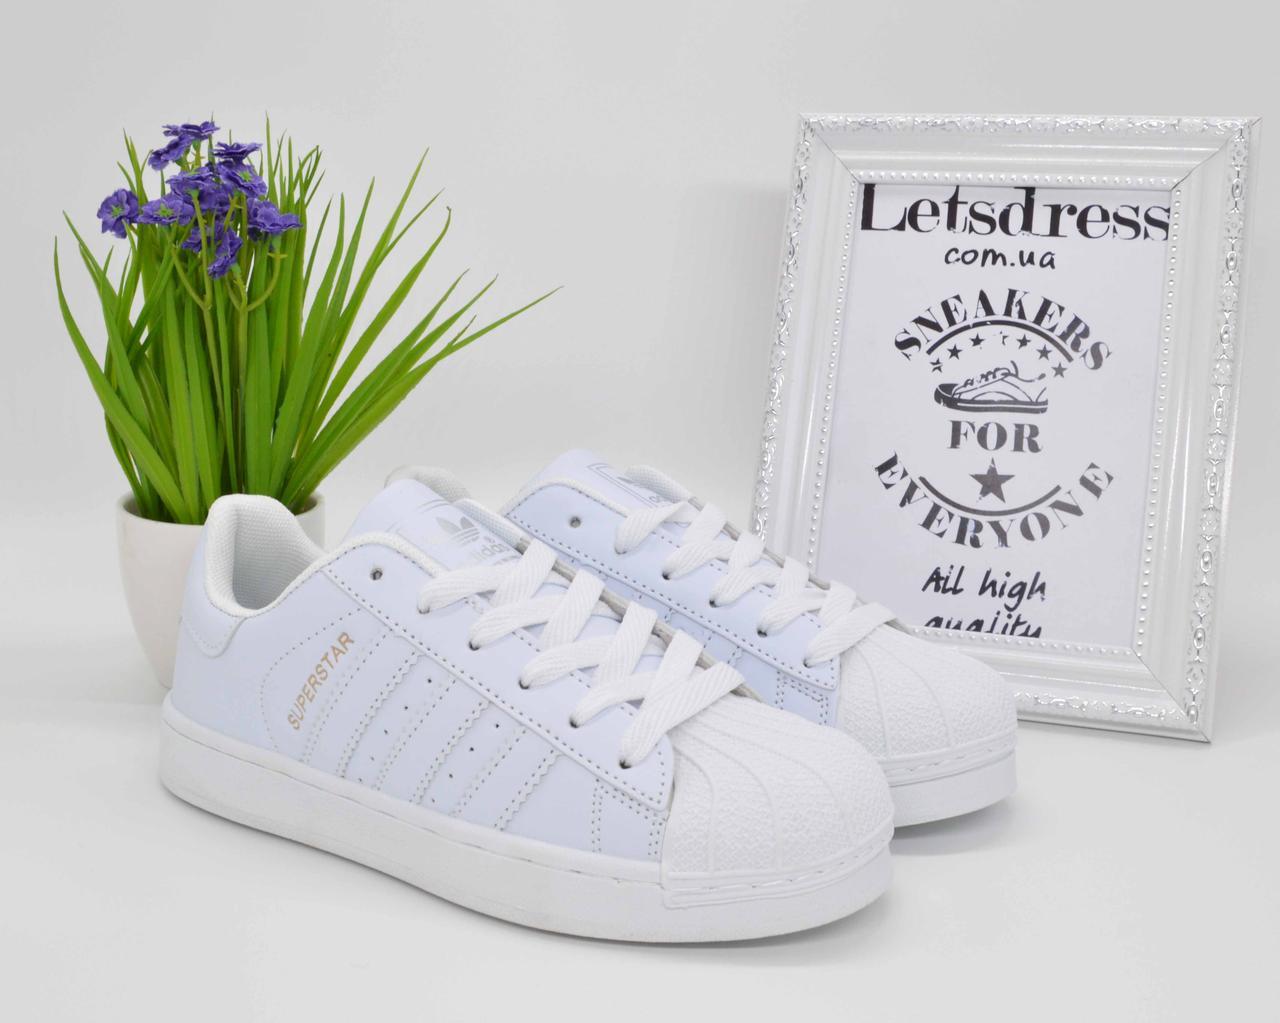 Кроссовки женские Adidas Superstar All White   Адидас Суперстар женские белые